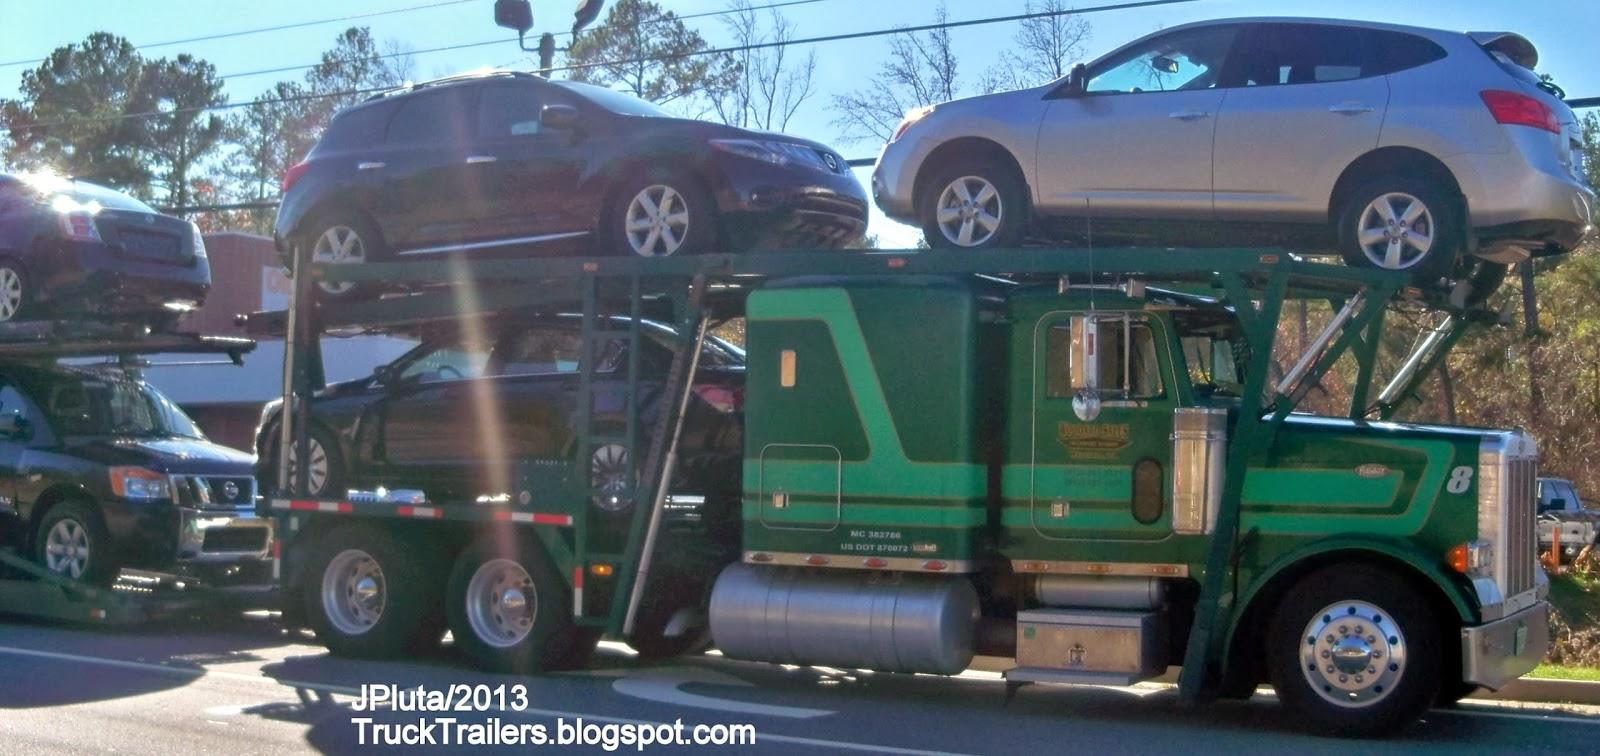 TRUCK TRAILER Transport Express Freight Logistic Diesel Mack ...